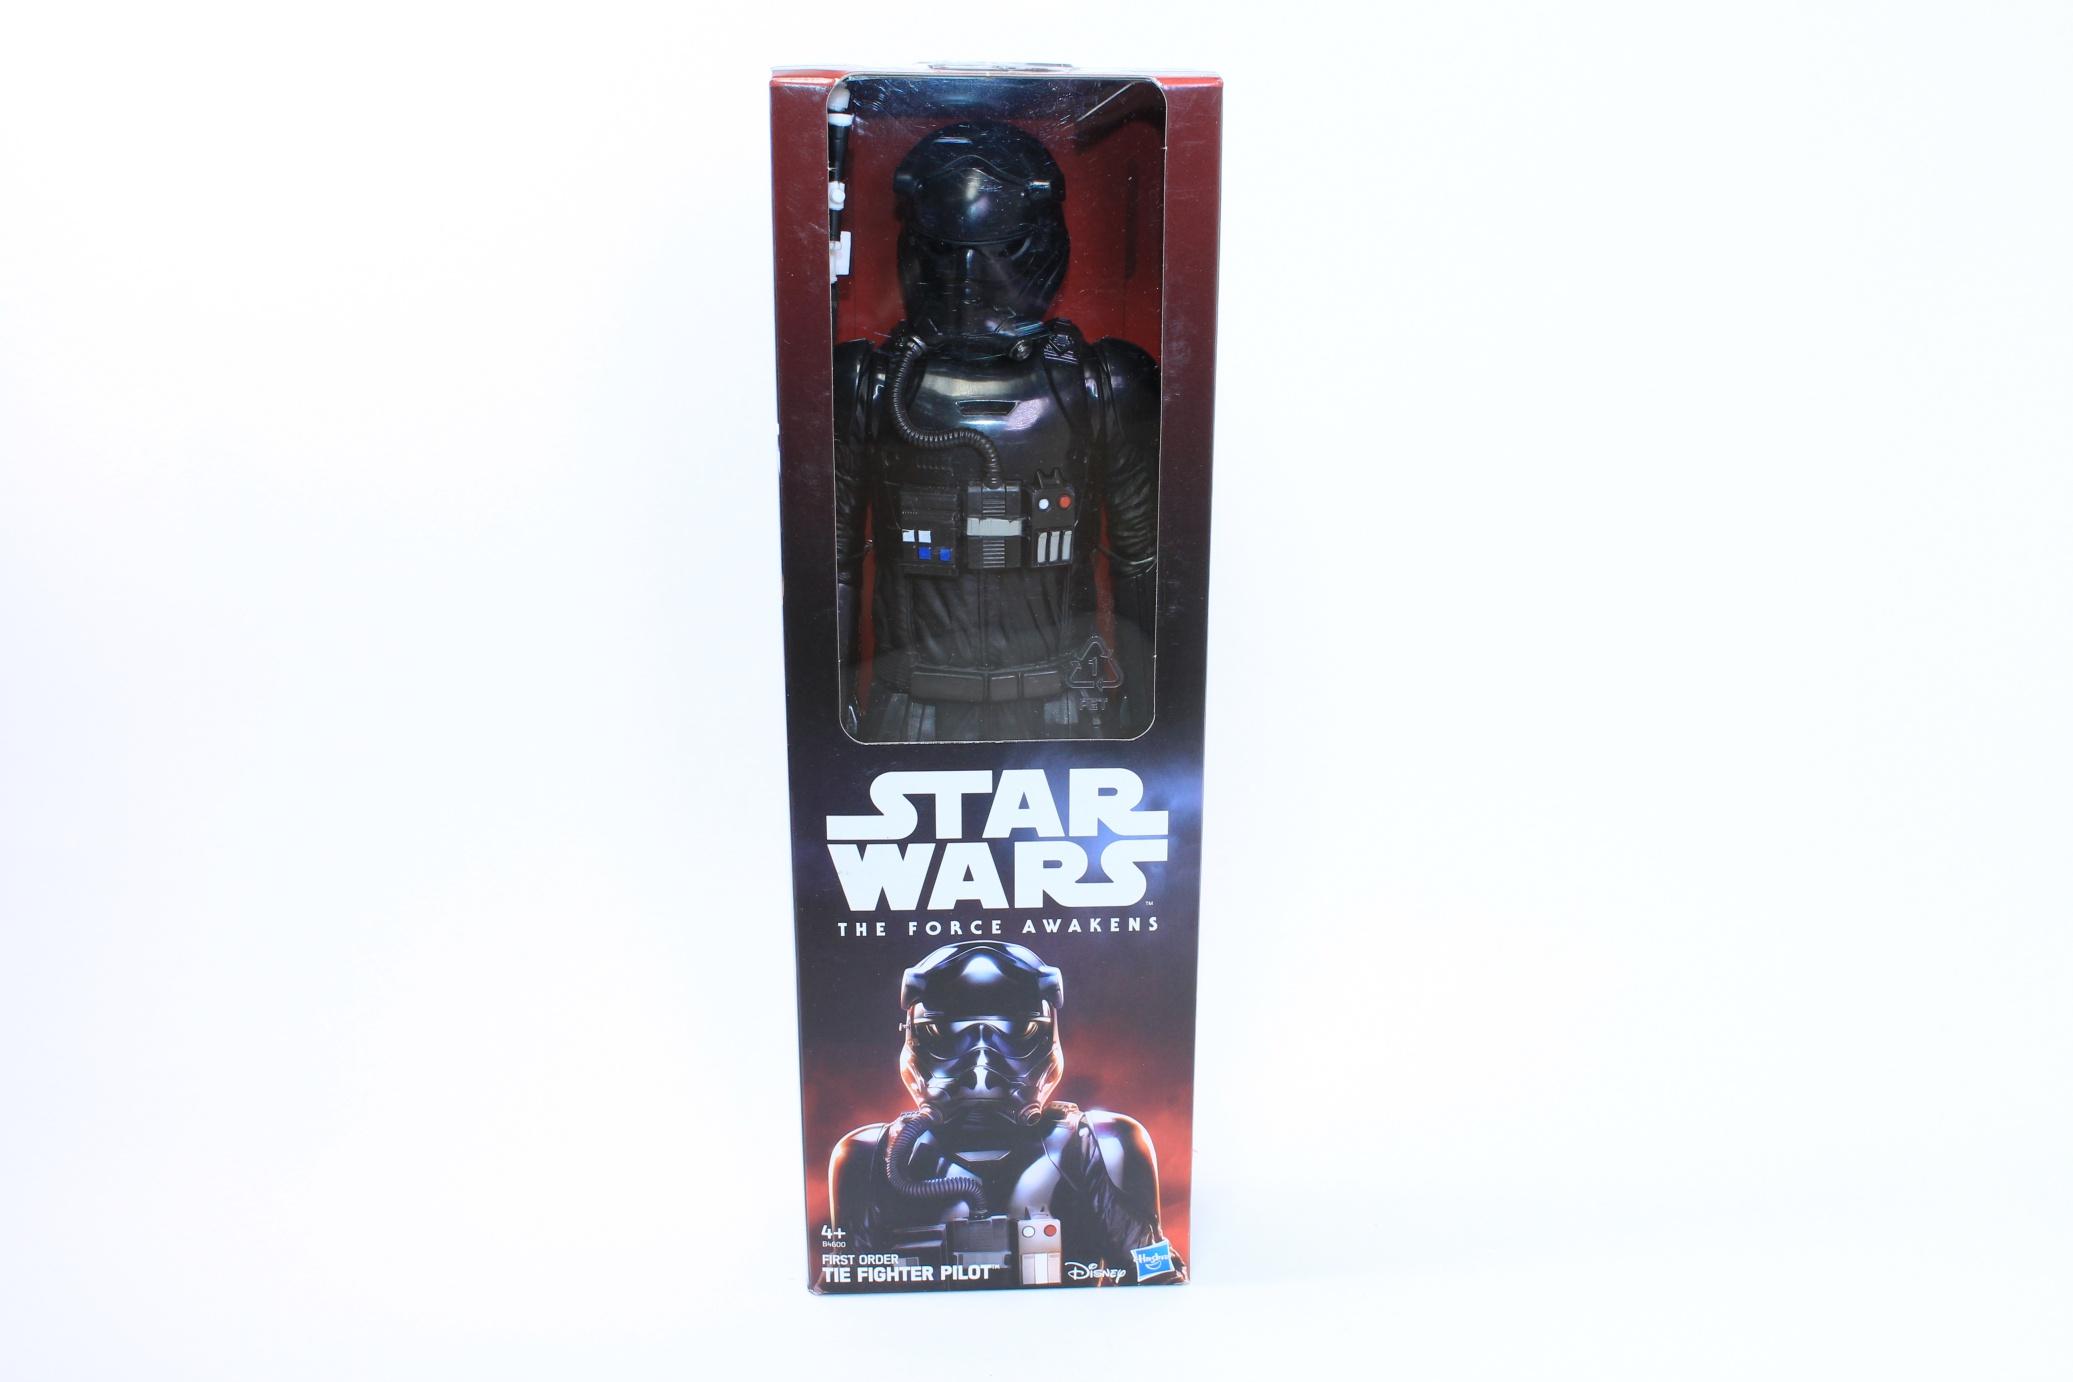 Medicom Bearbrick Star Wars 400/% First Order Stormtrooper FN-2187 Be@rbrick 1pc